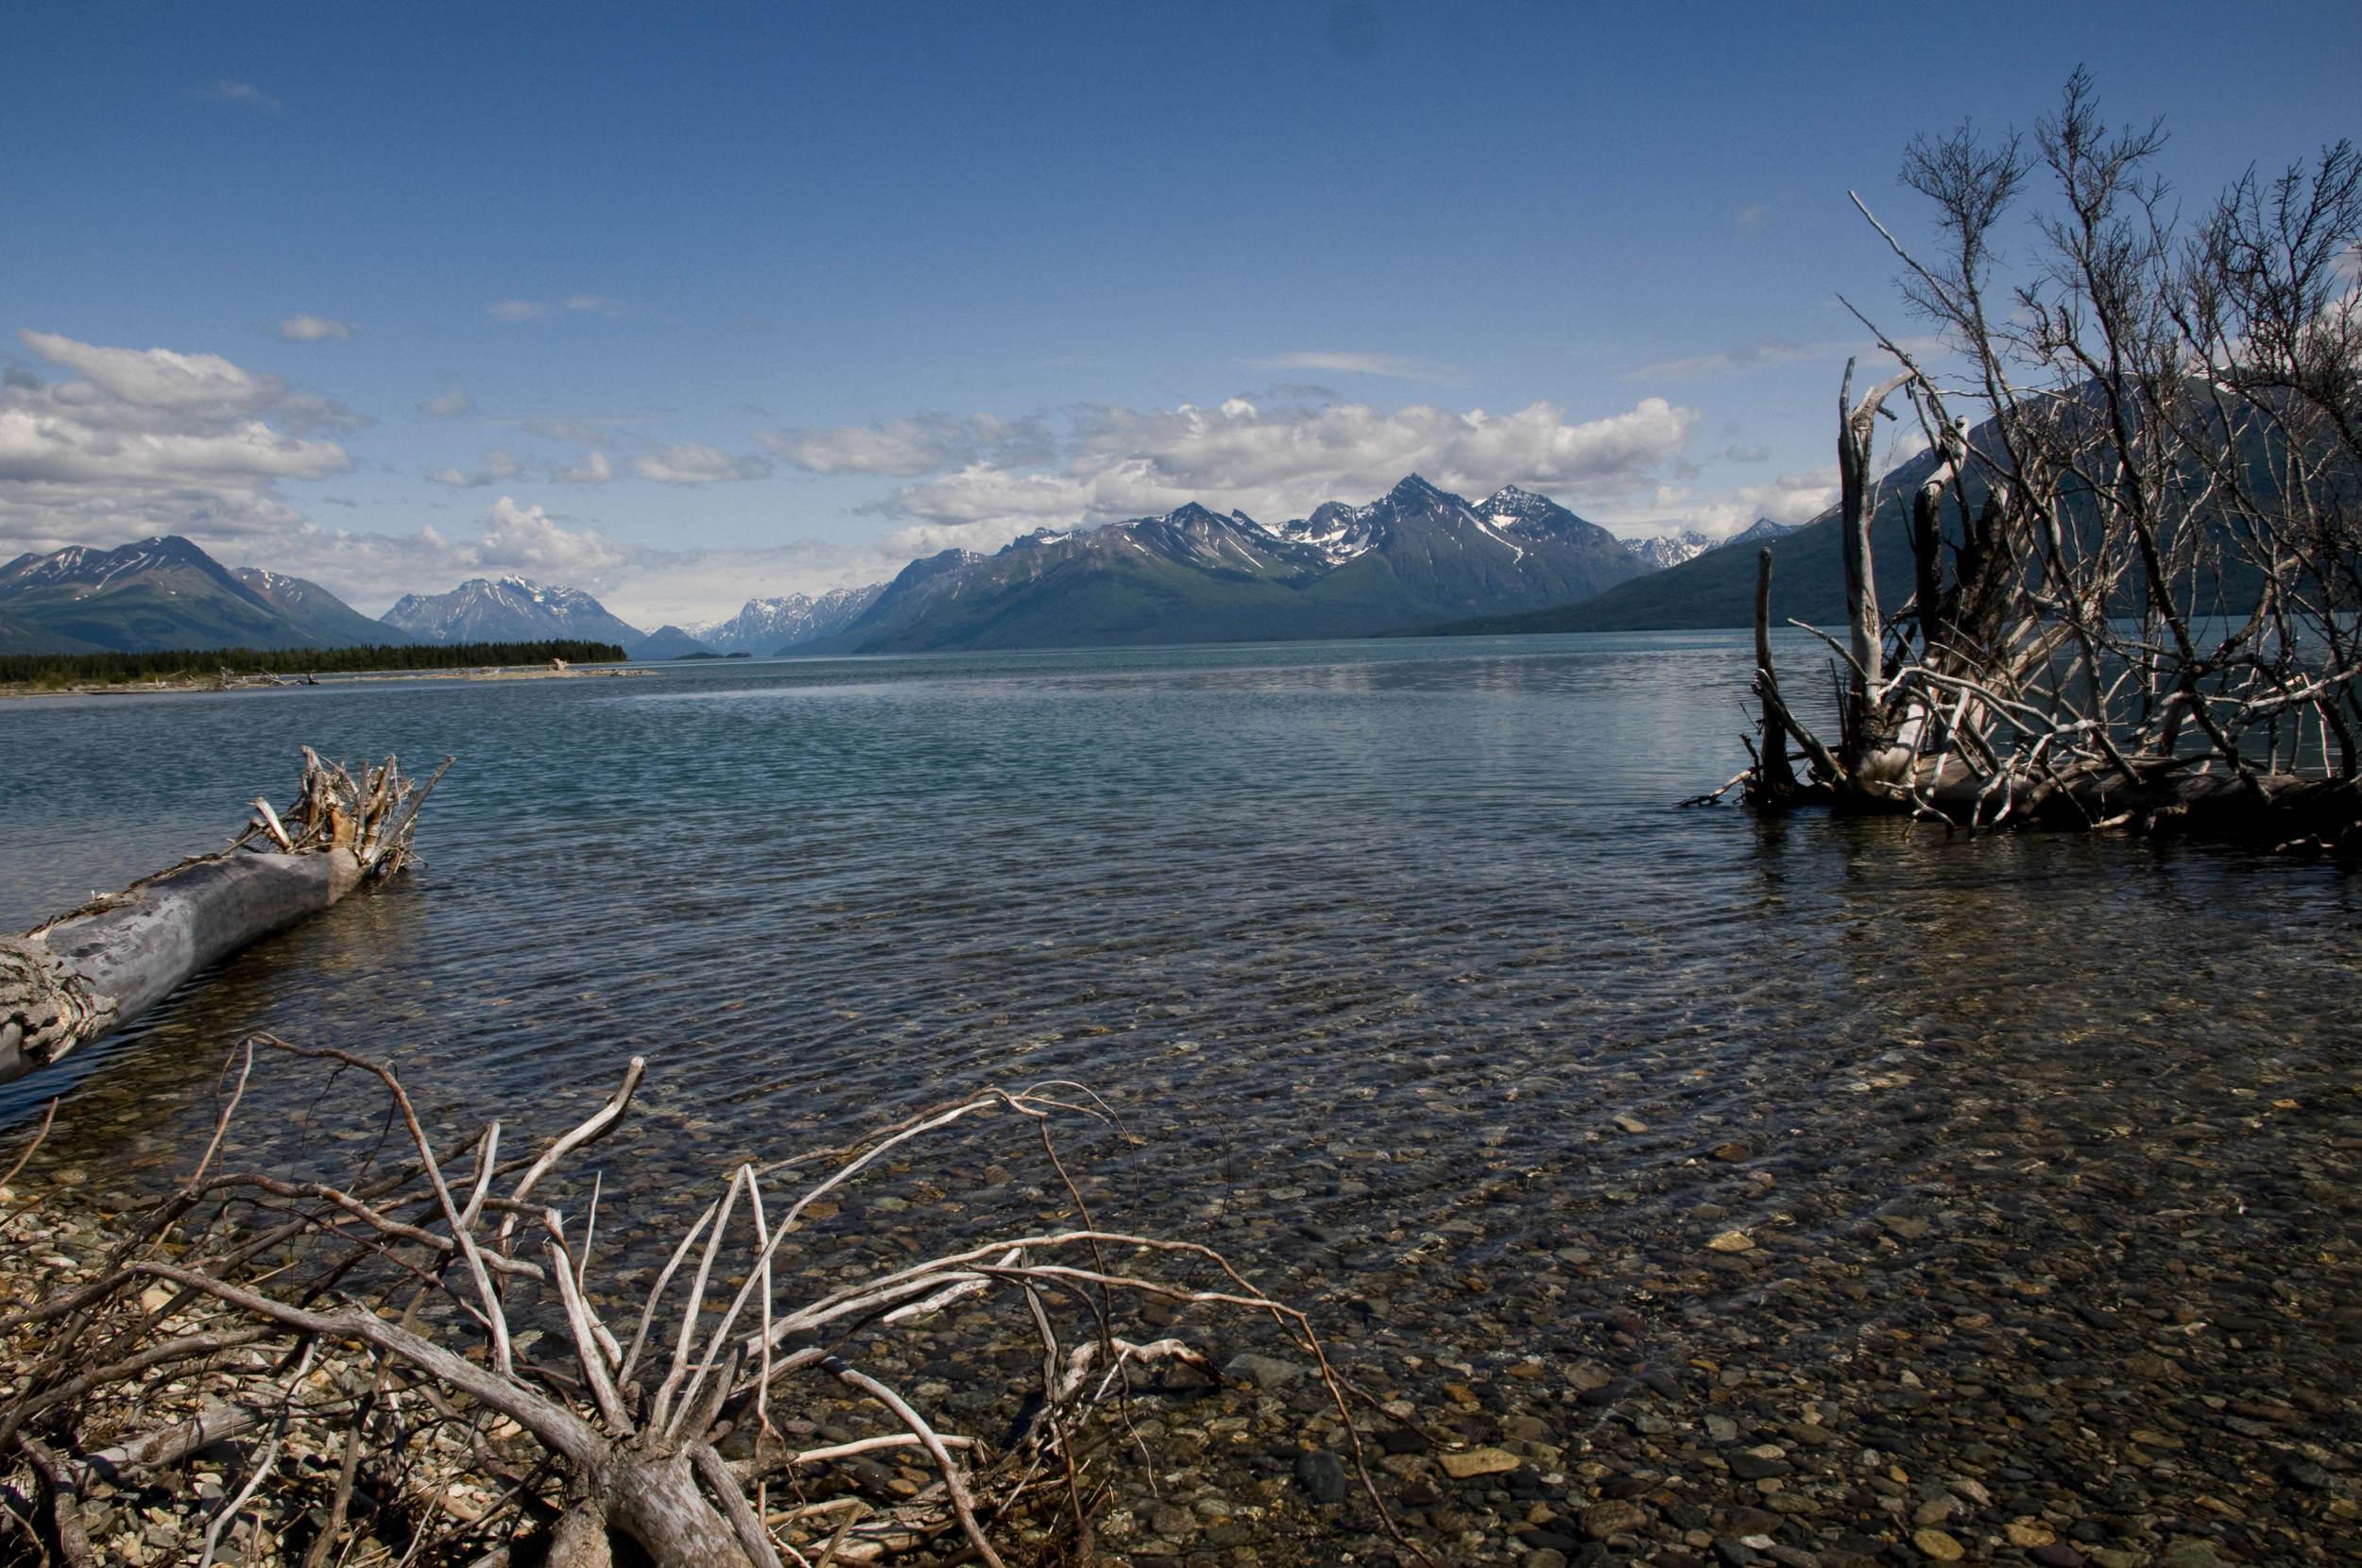 Lake Clark – (PHOTO: KEVIN E. BEASLEY/SHUTTERSTOCK)